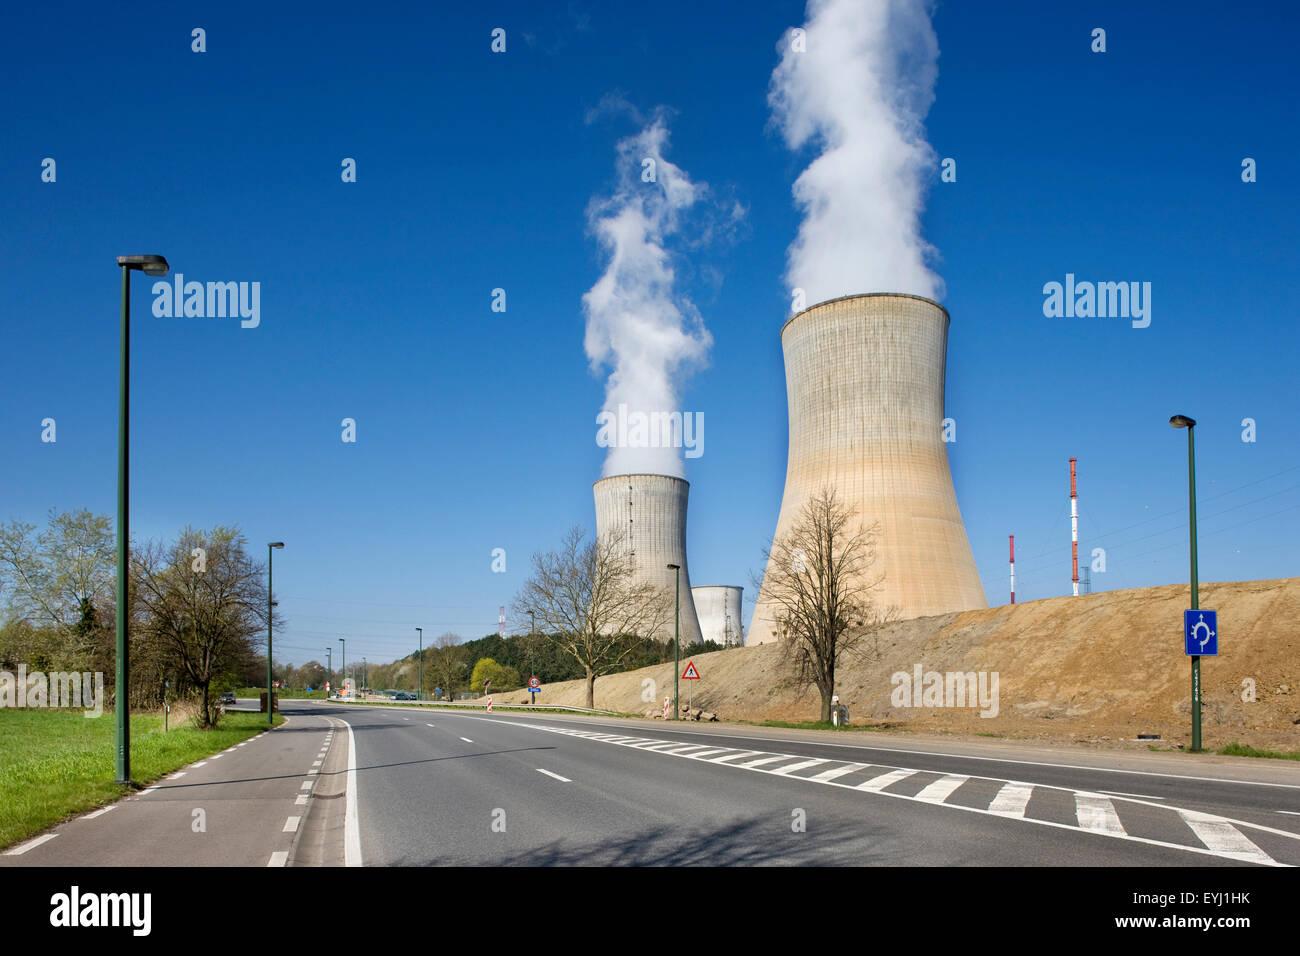 Kühltürme der Kernkraftwerk Tihange in Huy, Lüttich / Luik, Belgien Stockbild